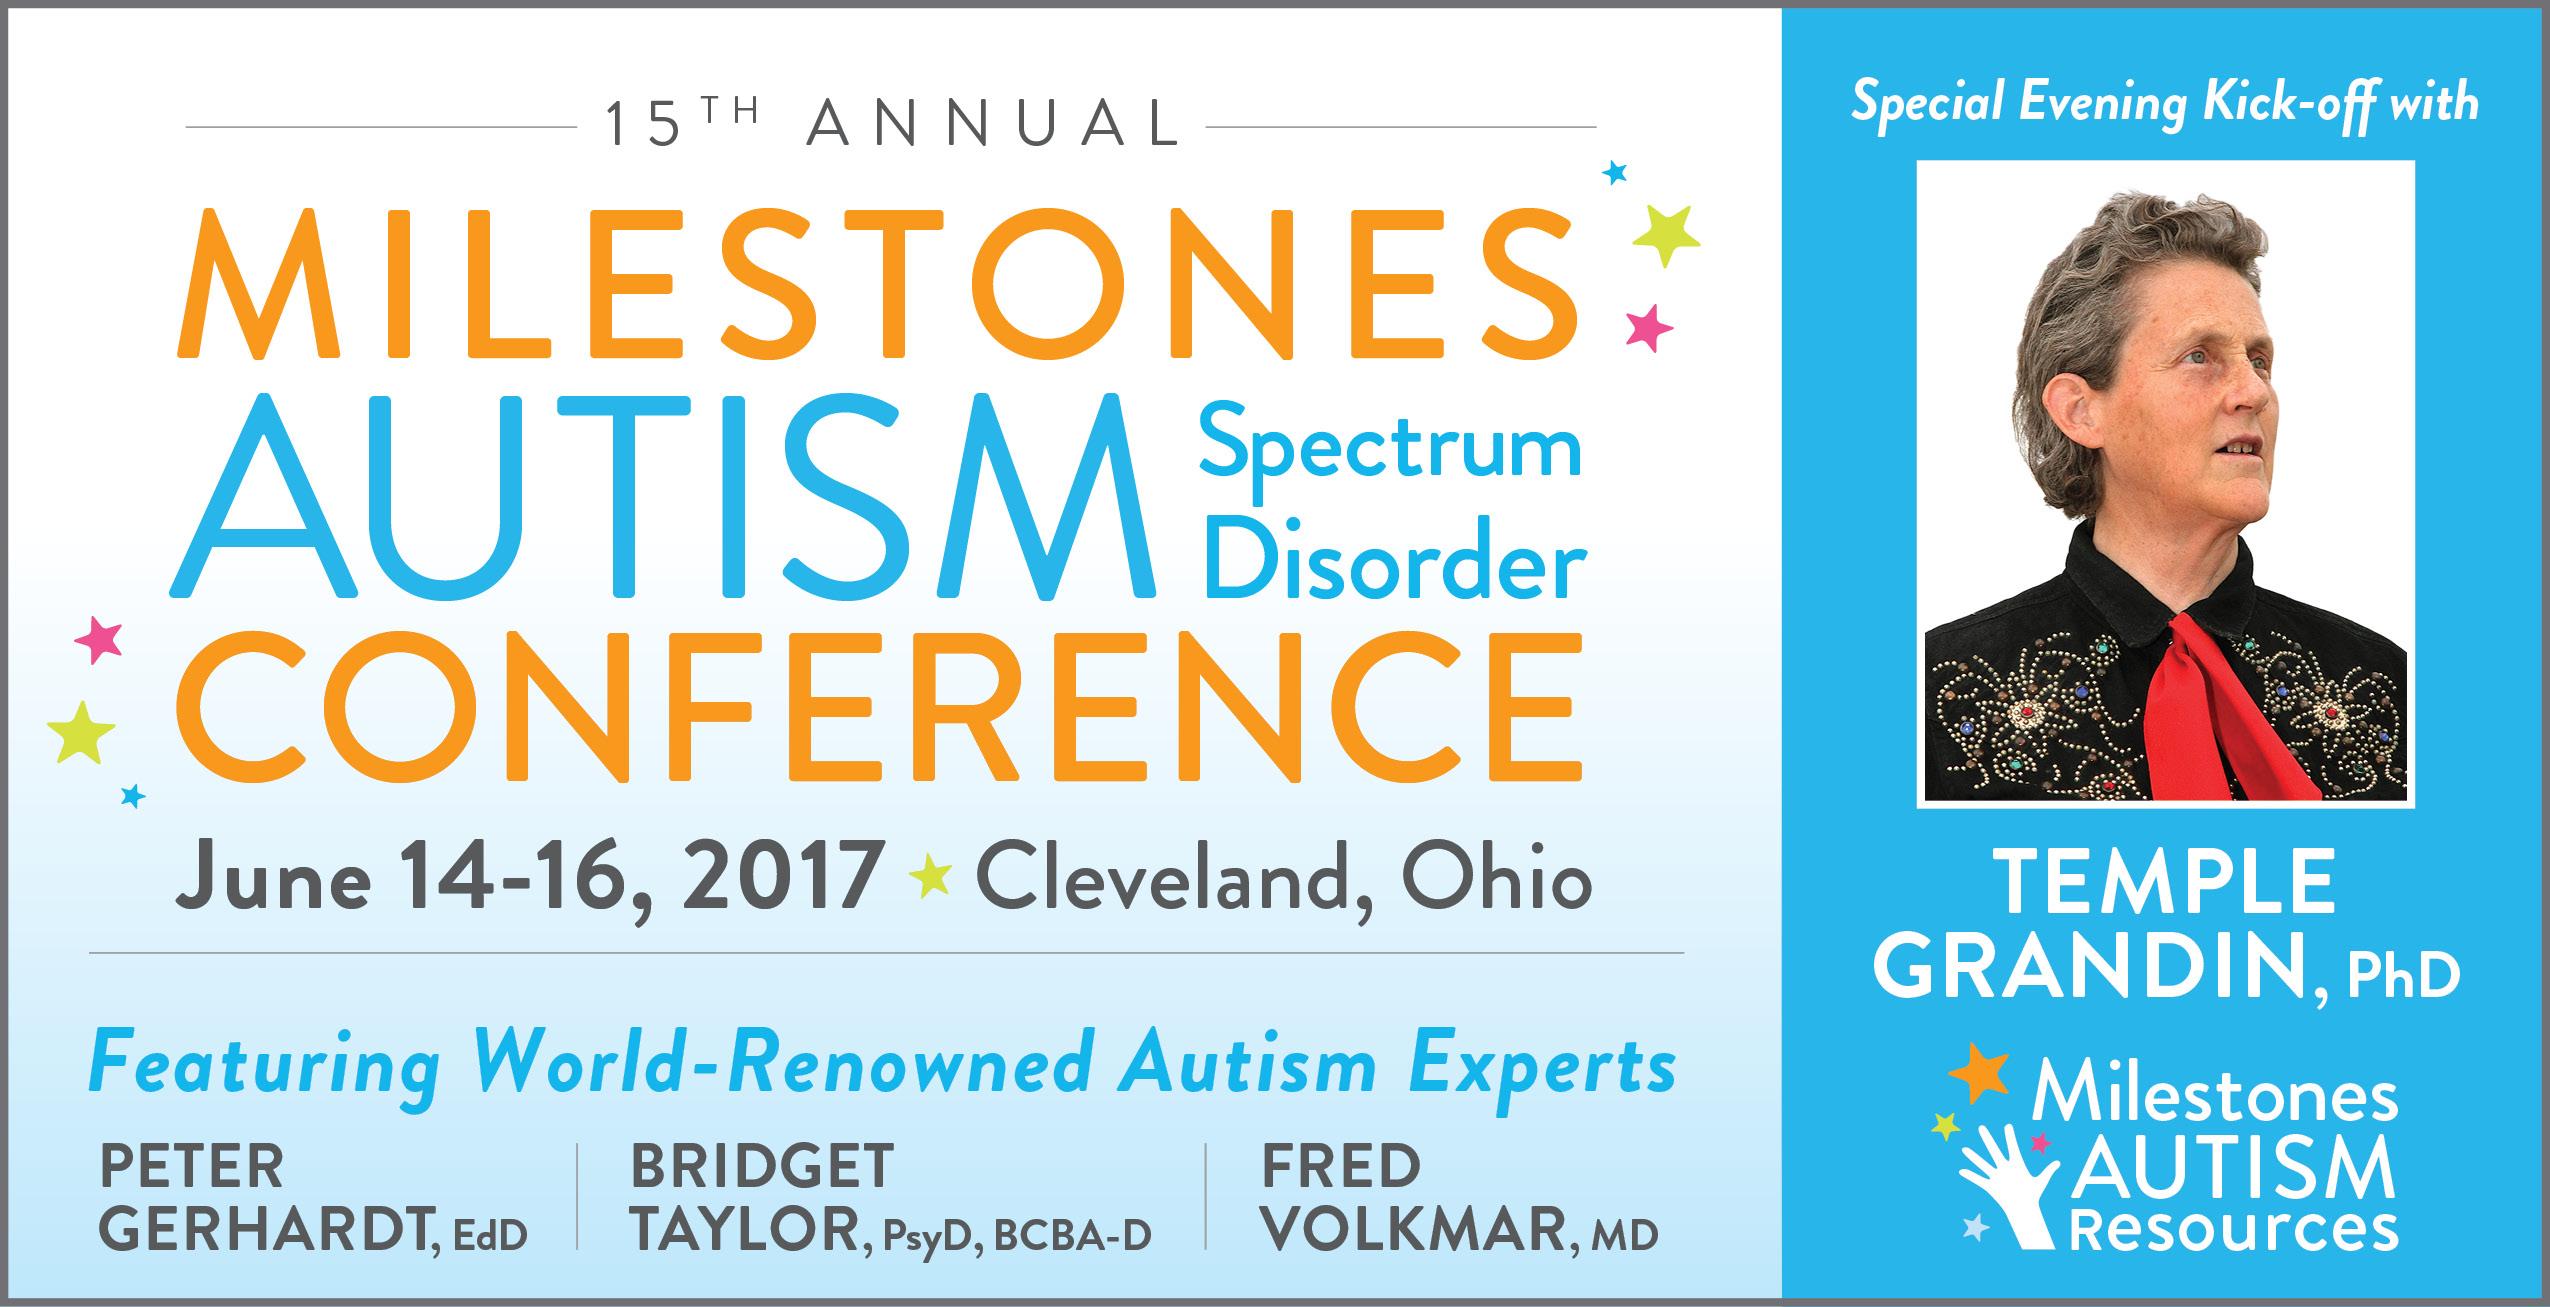 Milestones Autism Spectrum Disorder Conference